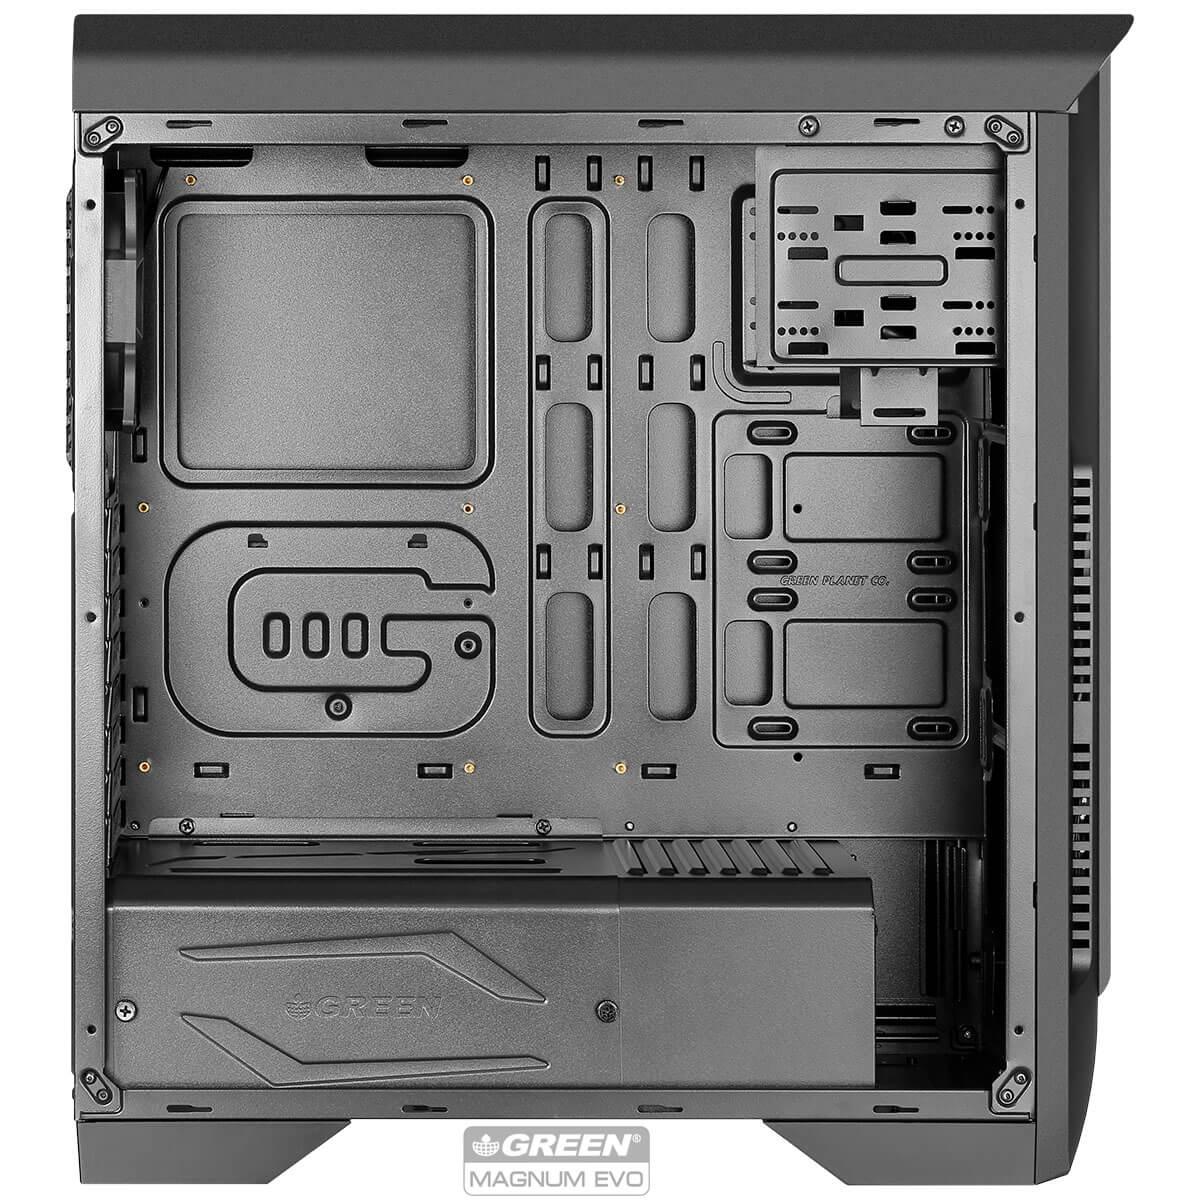 Magnum Evo 03 - کیس کامپیوتر گرین مدل Magnum Evo